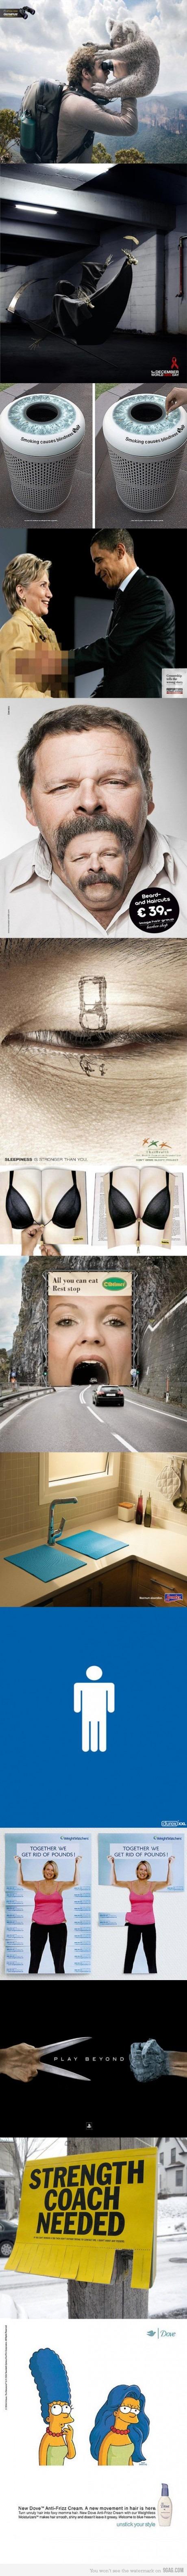 Great Advertisements